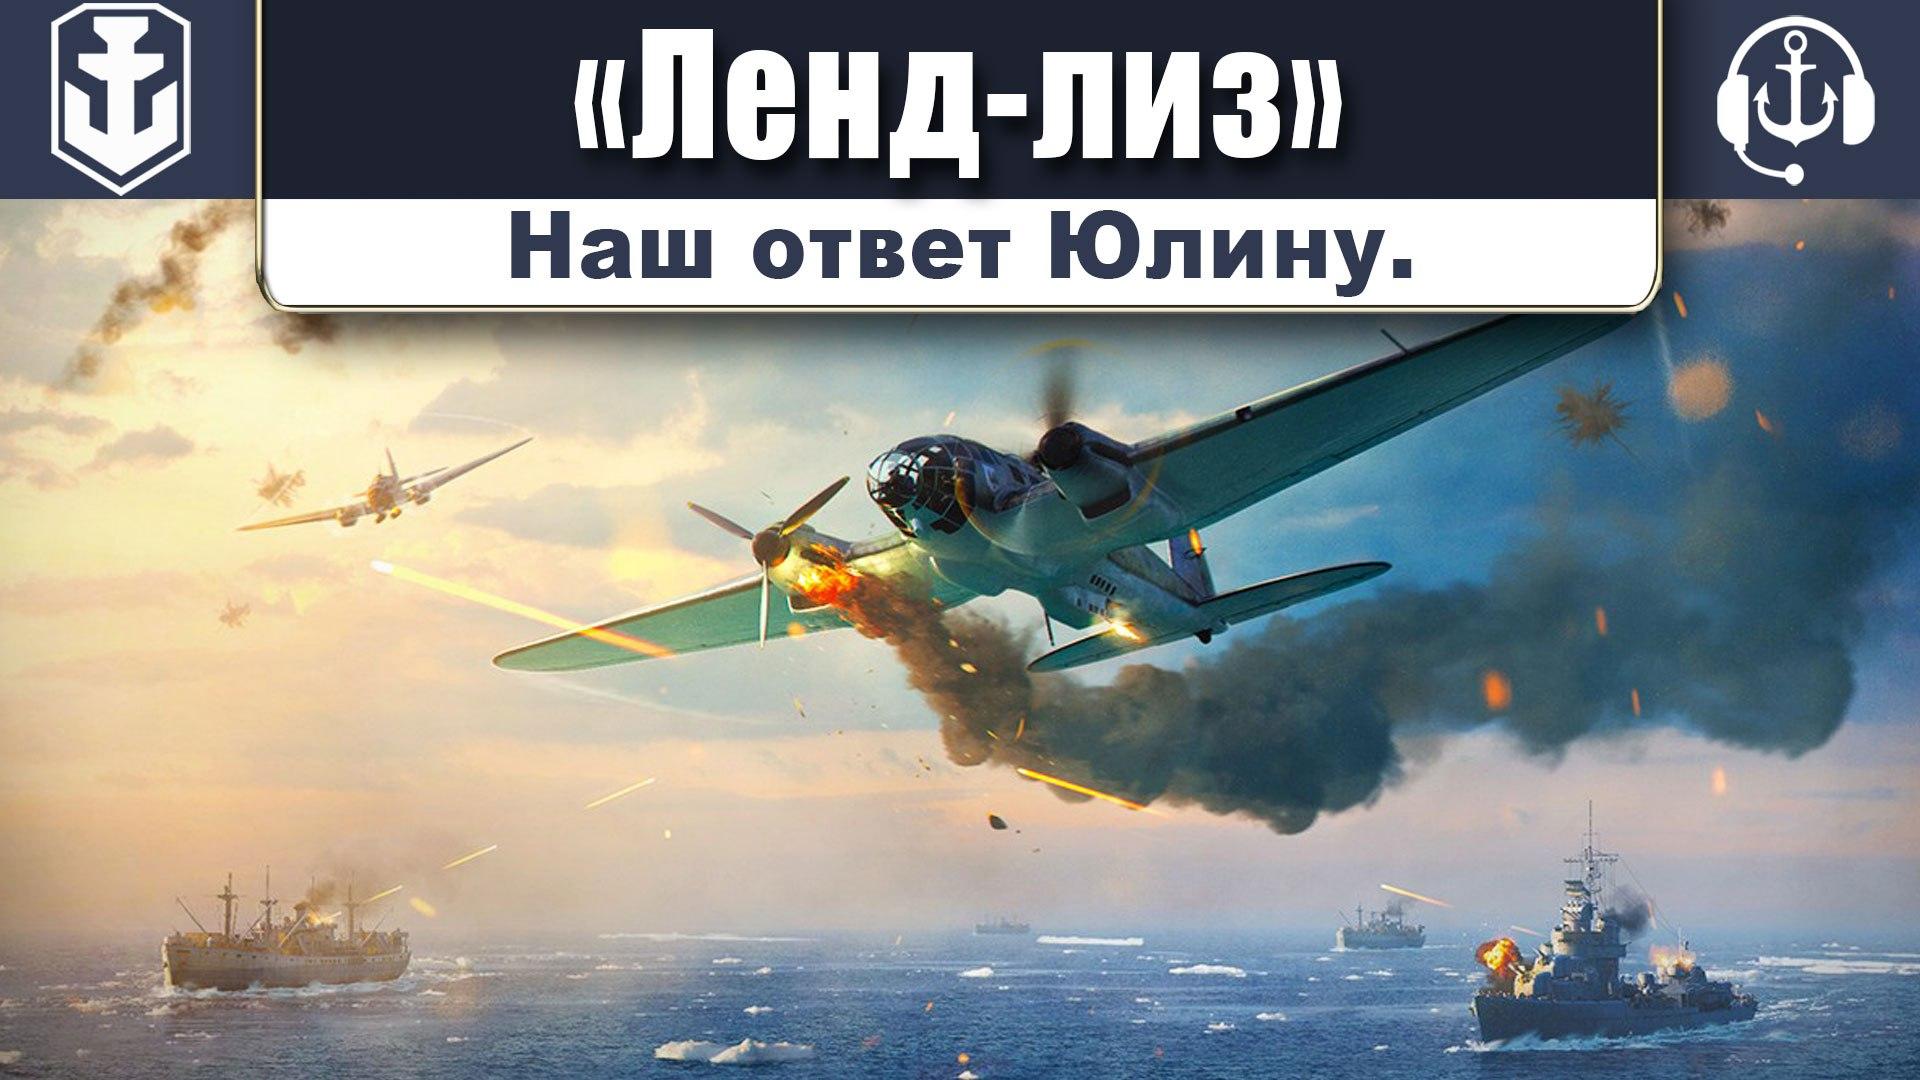 bwHlF_kuLSA.jpg